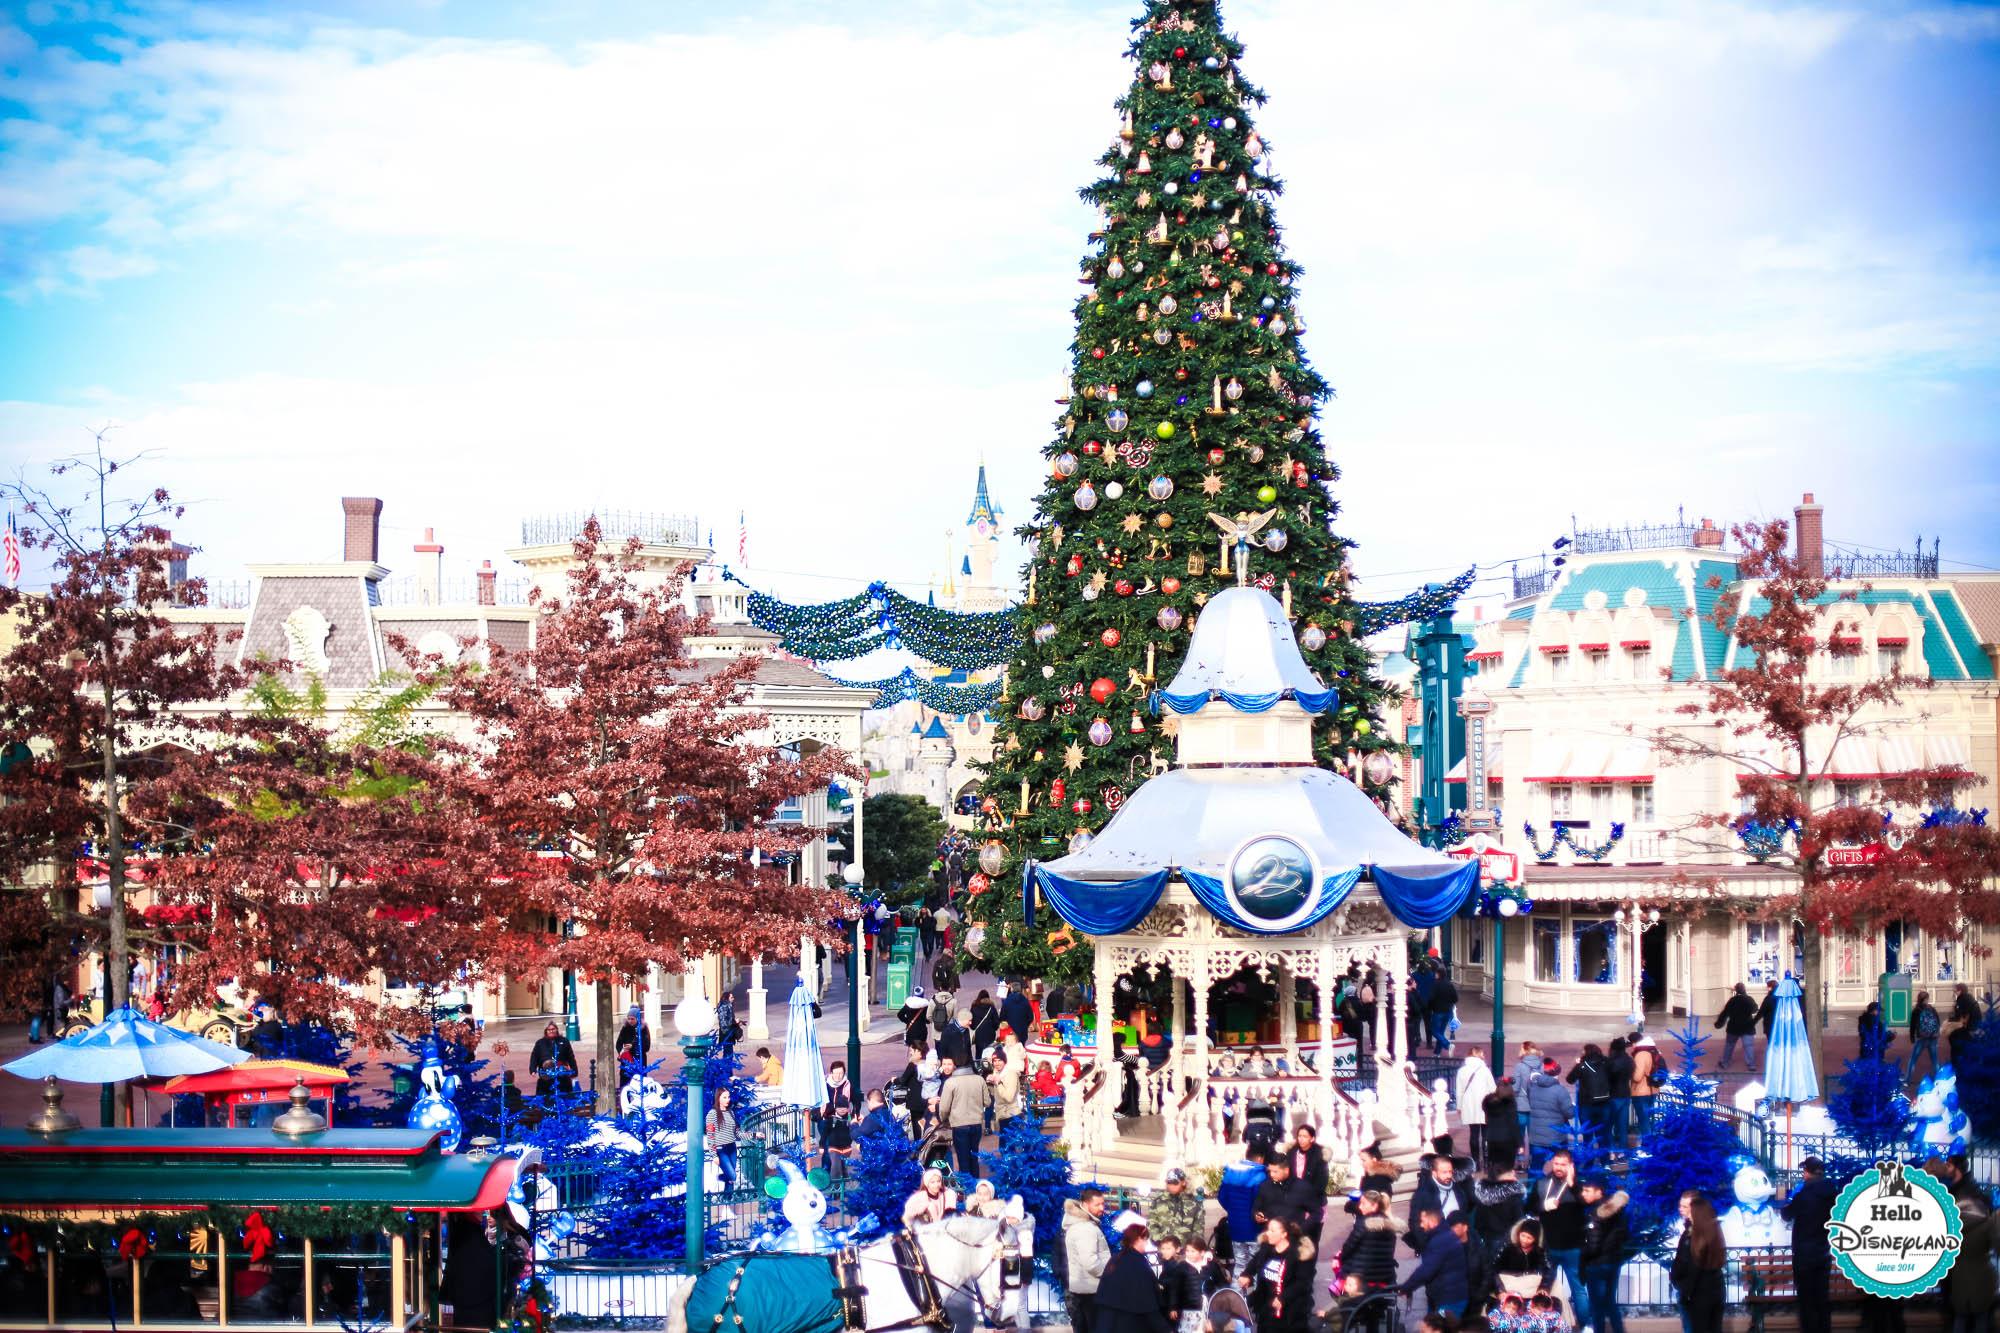 Hello disneyland le blog n 1 sur disneyland paris no l - Disneyland paris noel 2017 ...